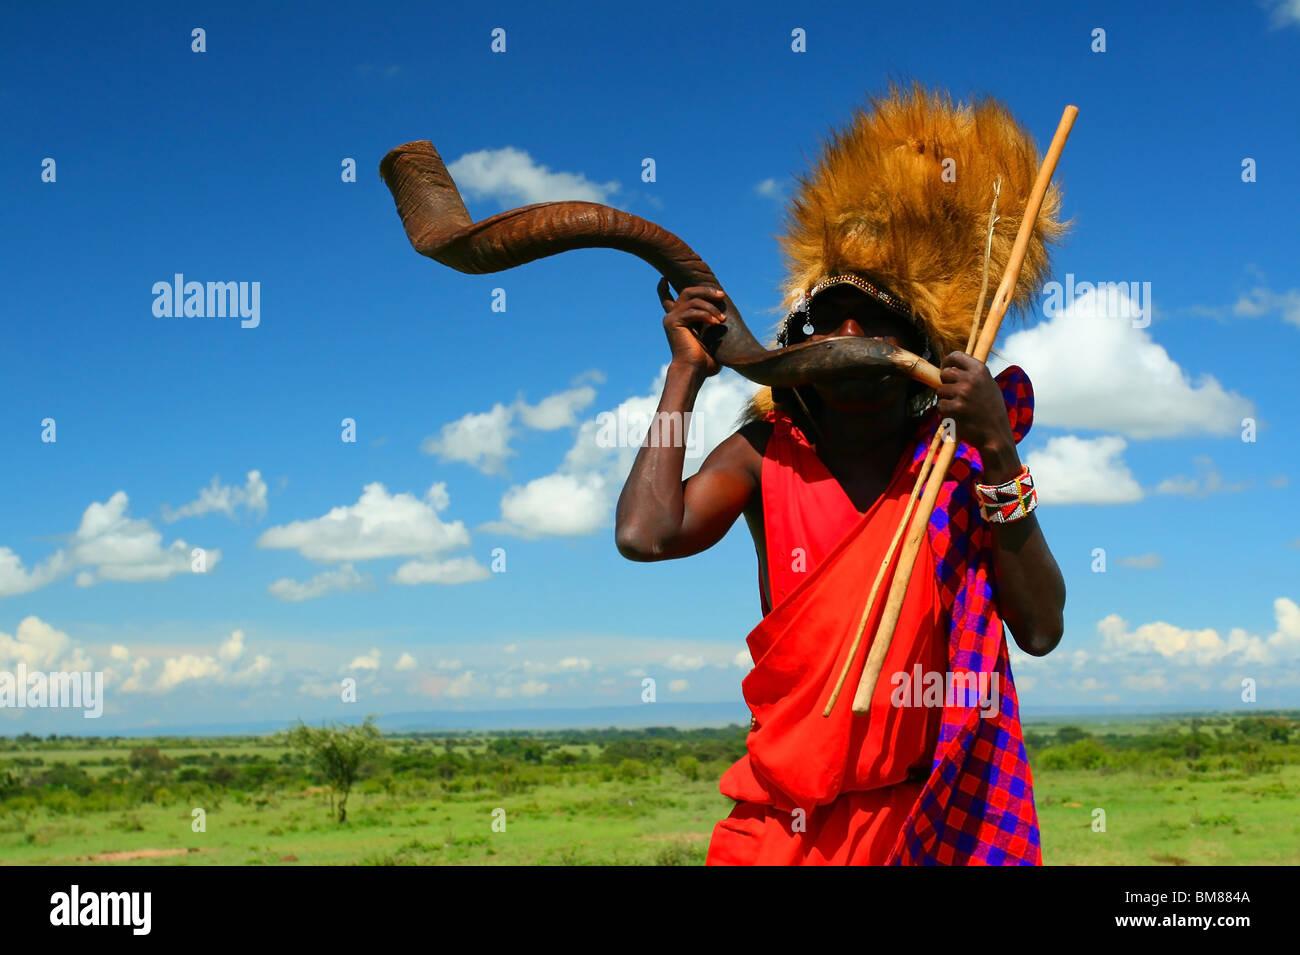 Masai warrior playing traditional horn. Africa. Kenya. Masai Mara - Stock Image